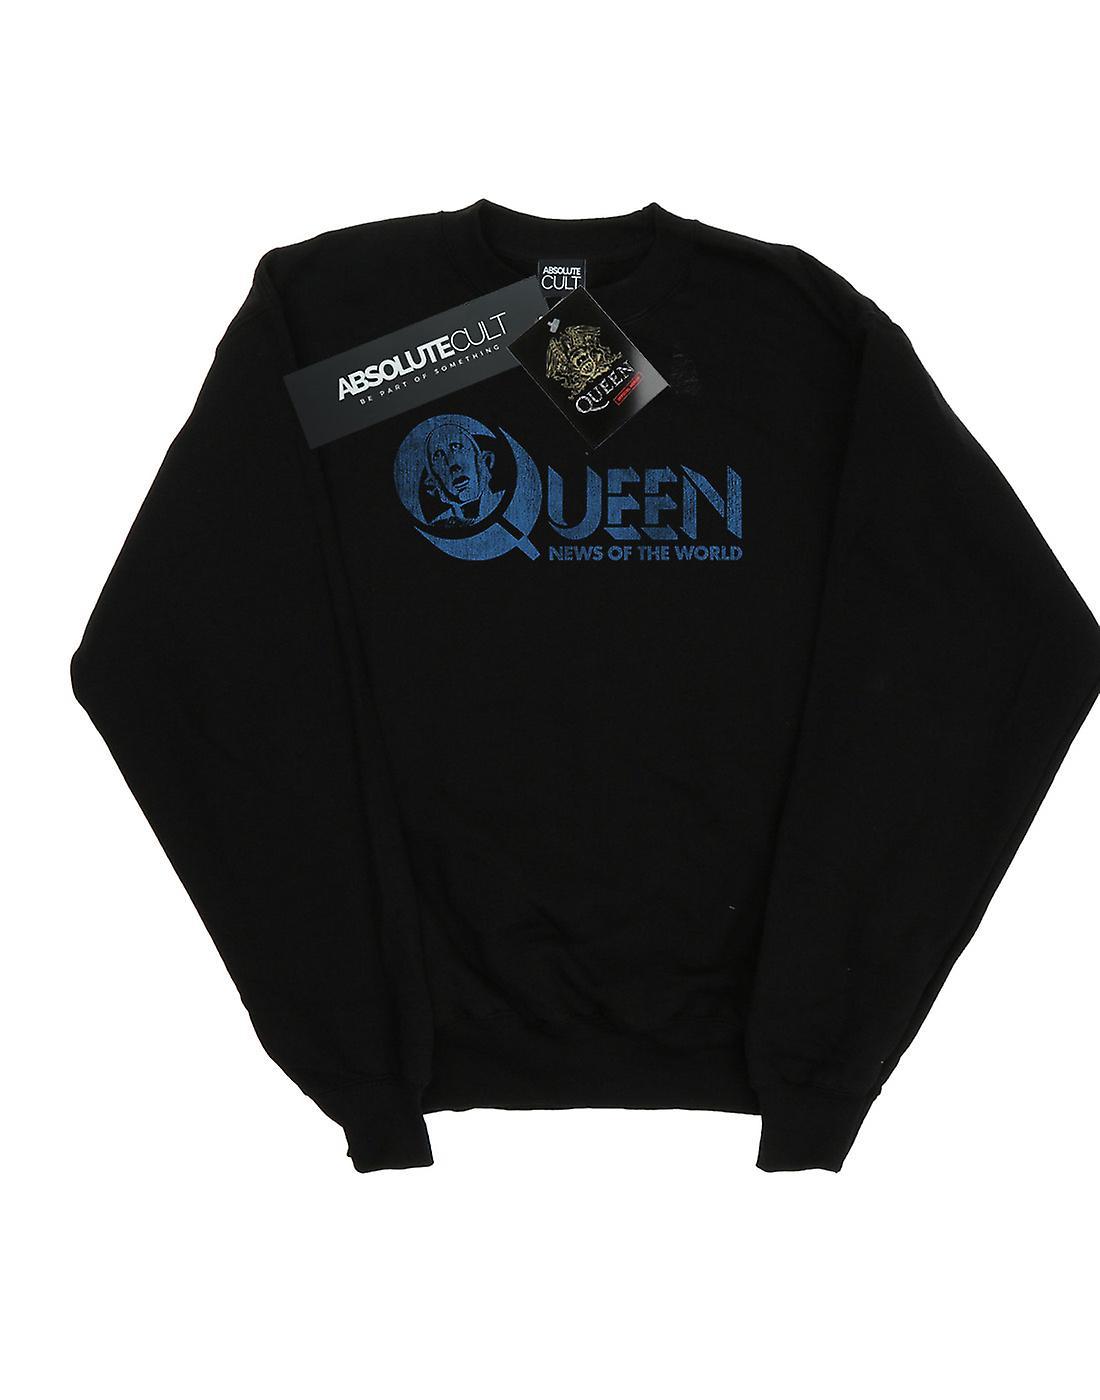 Queen Girls Distressed News Of The World Sweatshirt